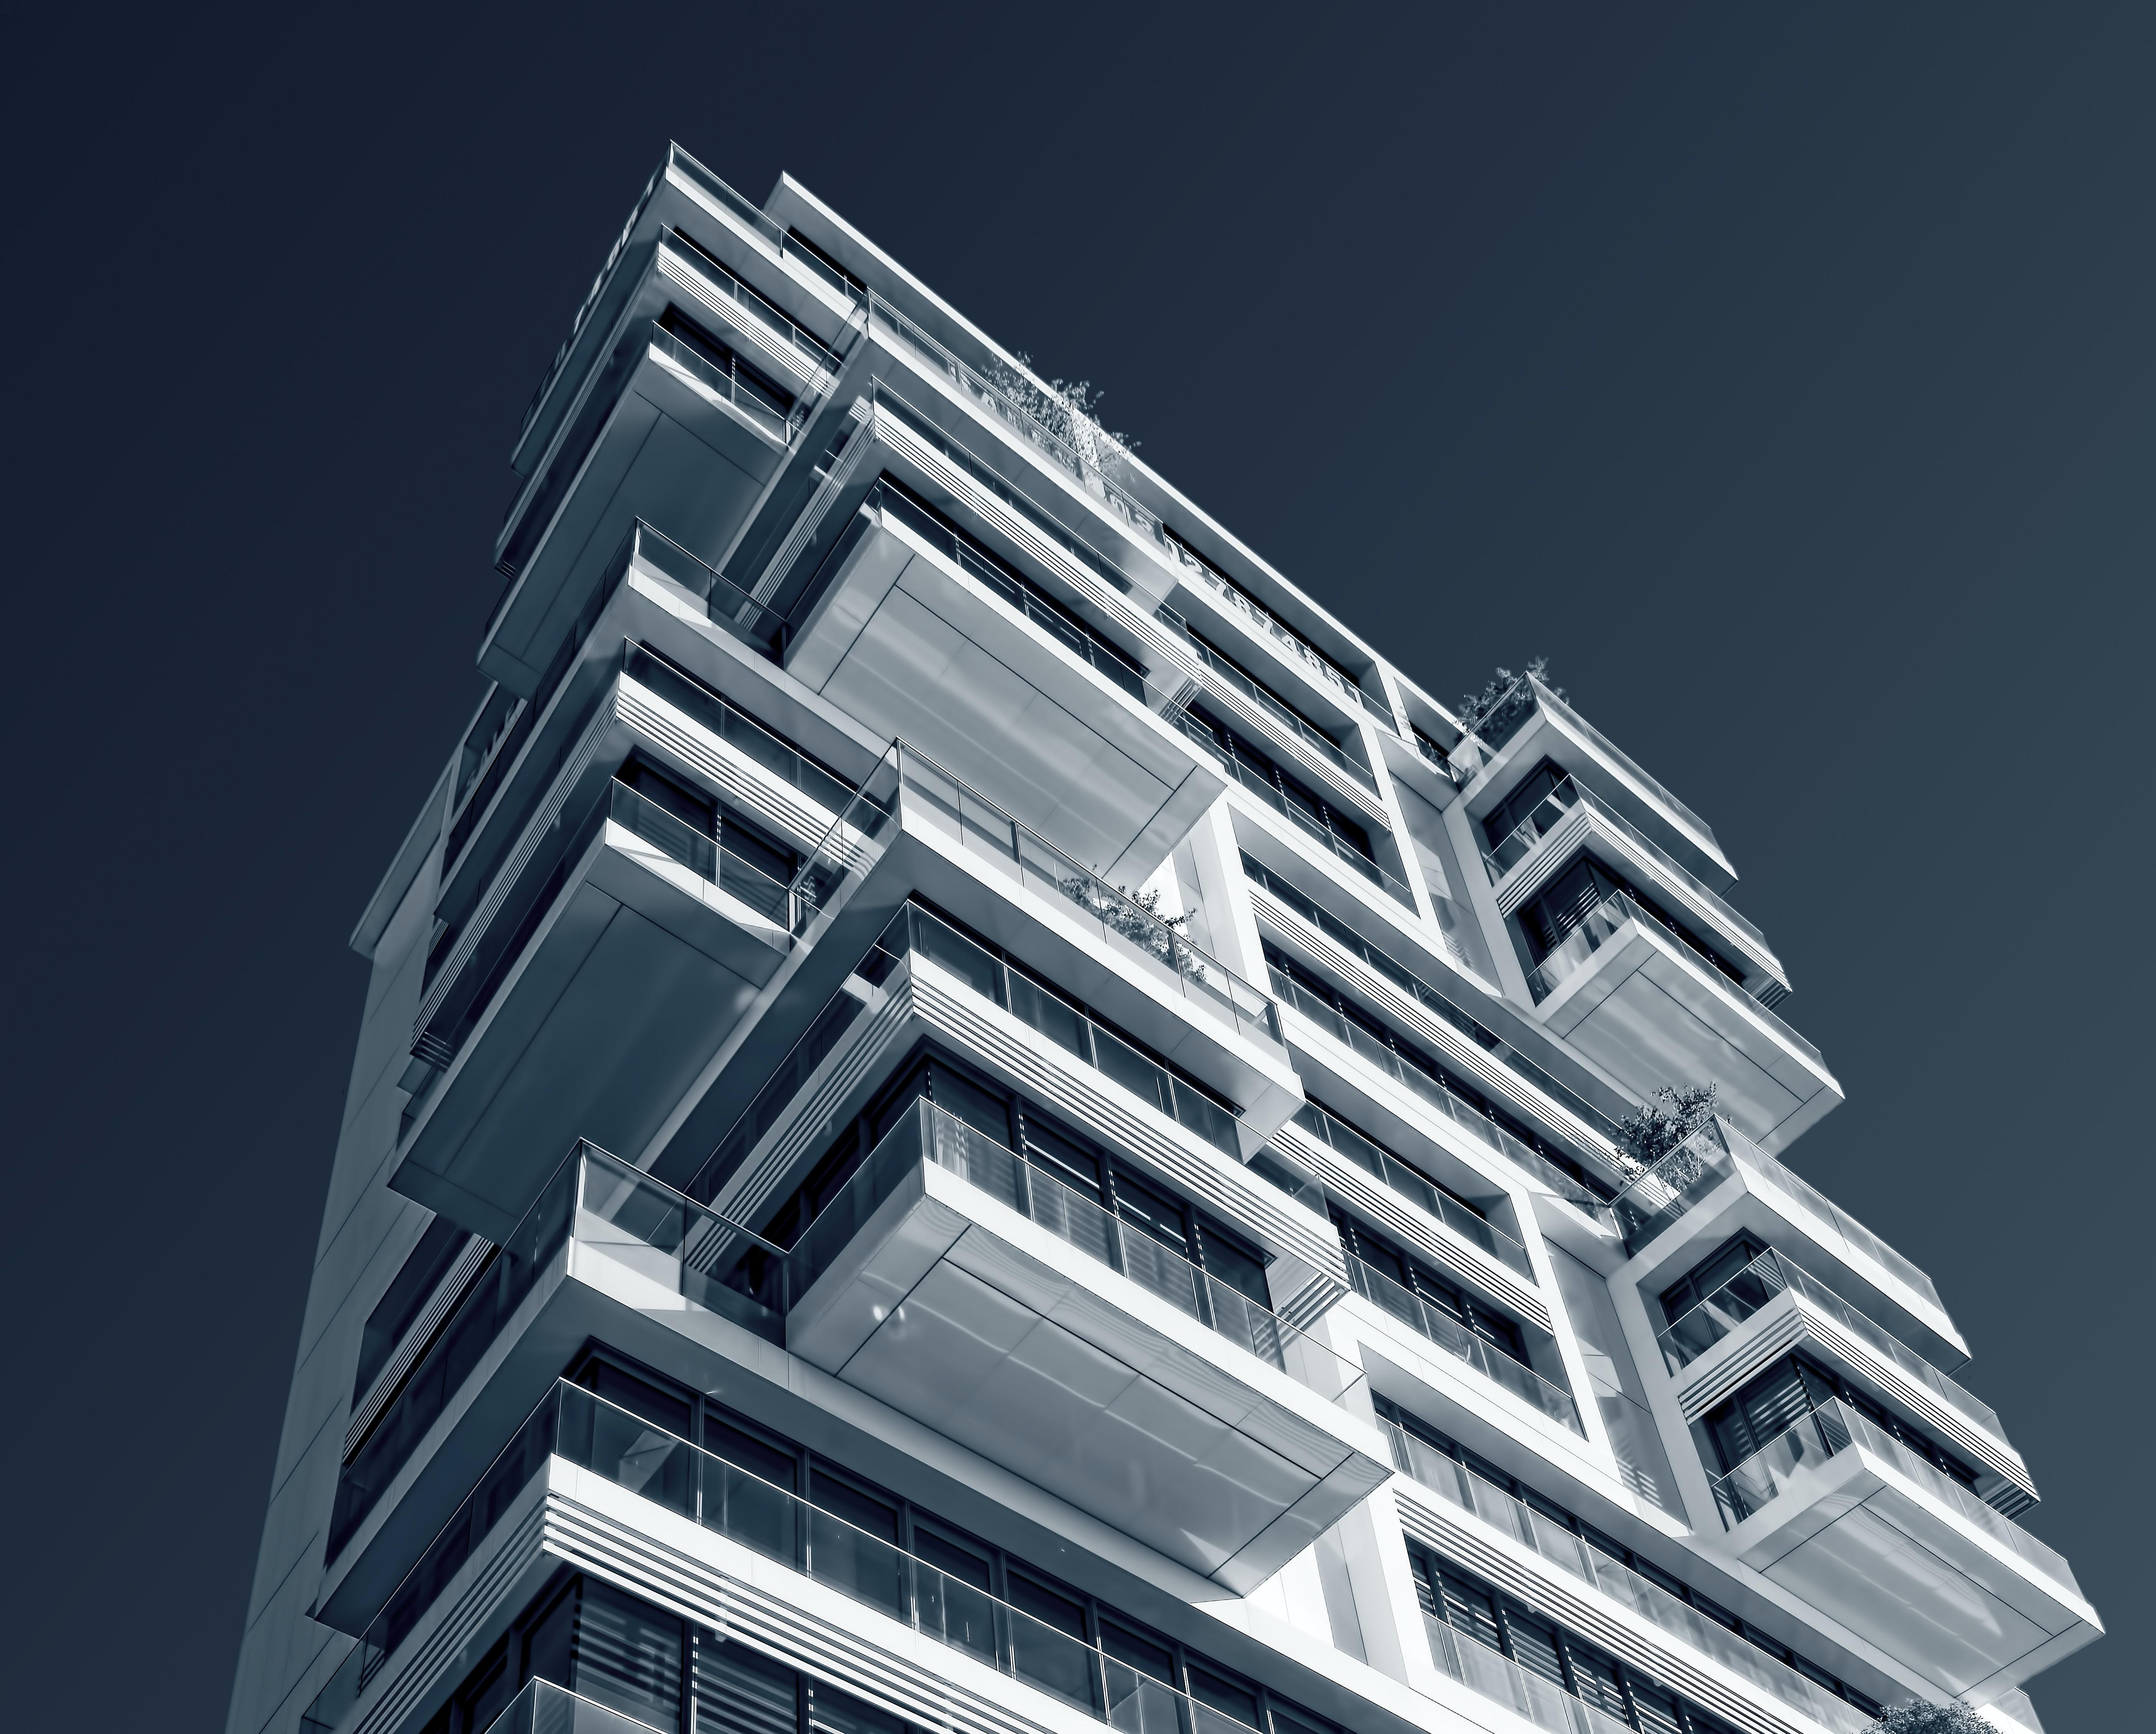 low angle photography of condominium